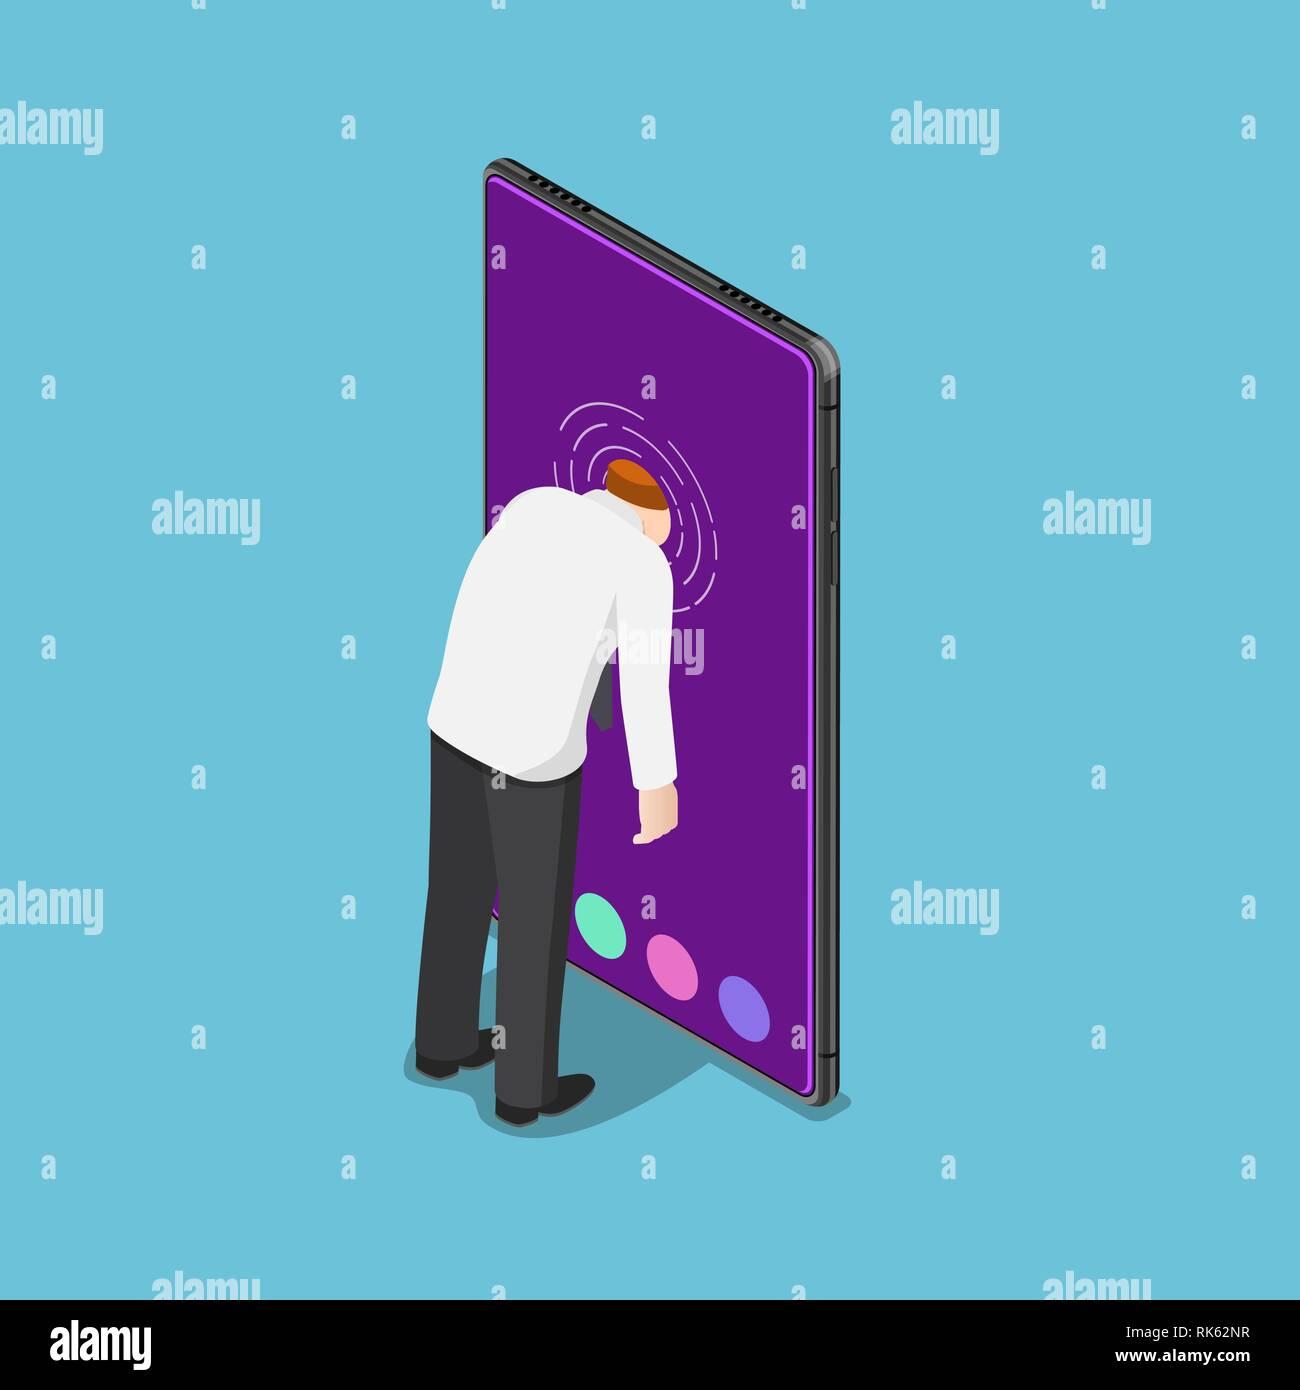 Flat 3d isometric businessman push his head into smartphone. Smartphone addiction concept. - Stock Image